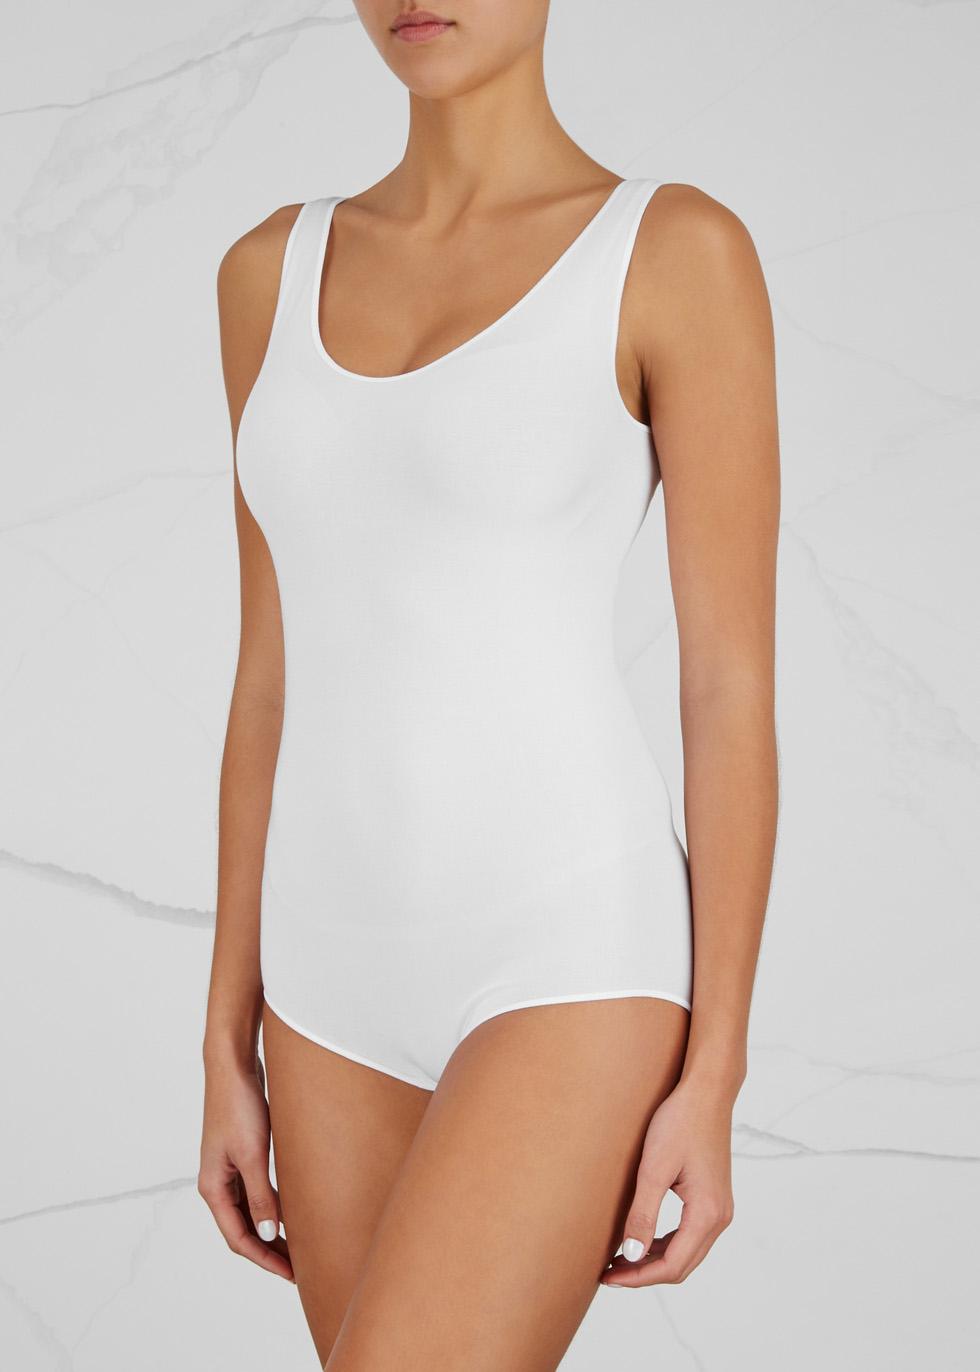 White seamless jersey bodysuit - Wolford